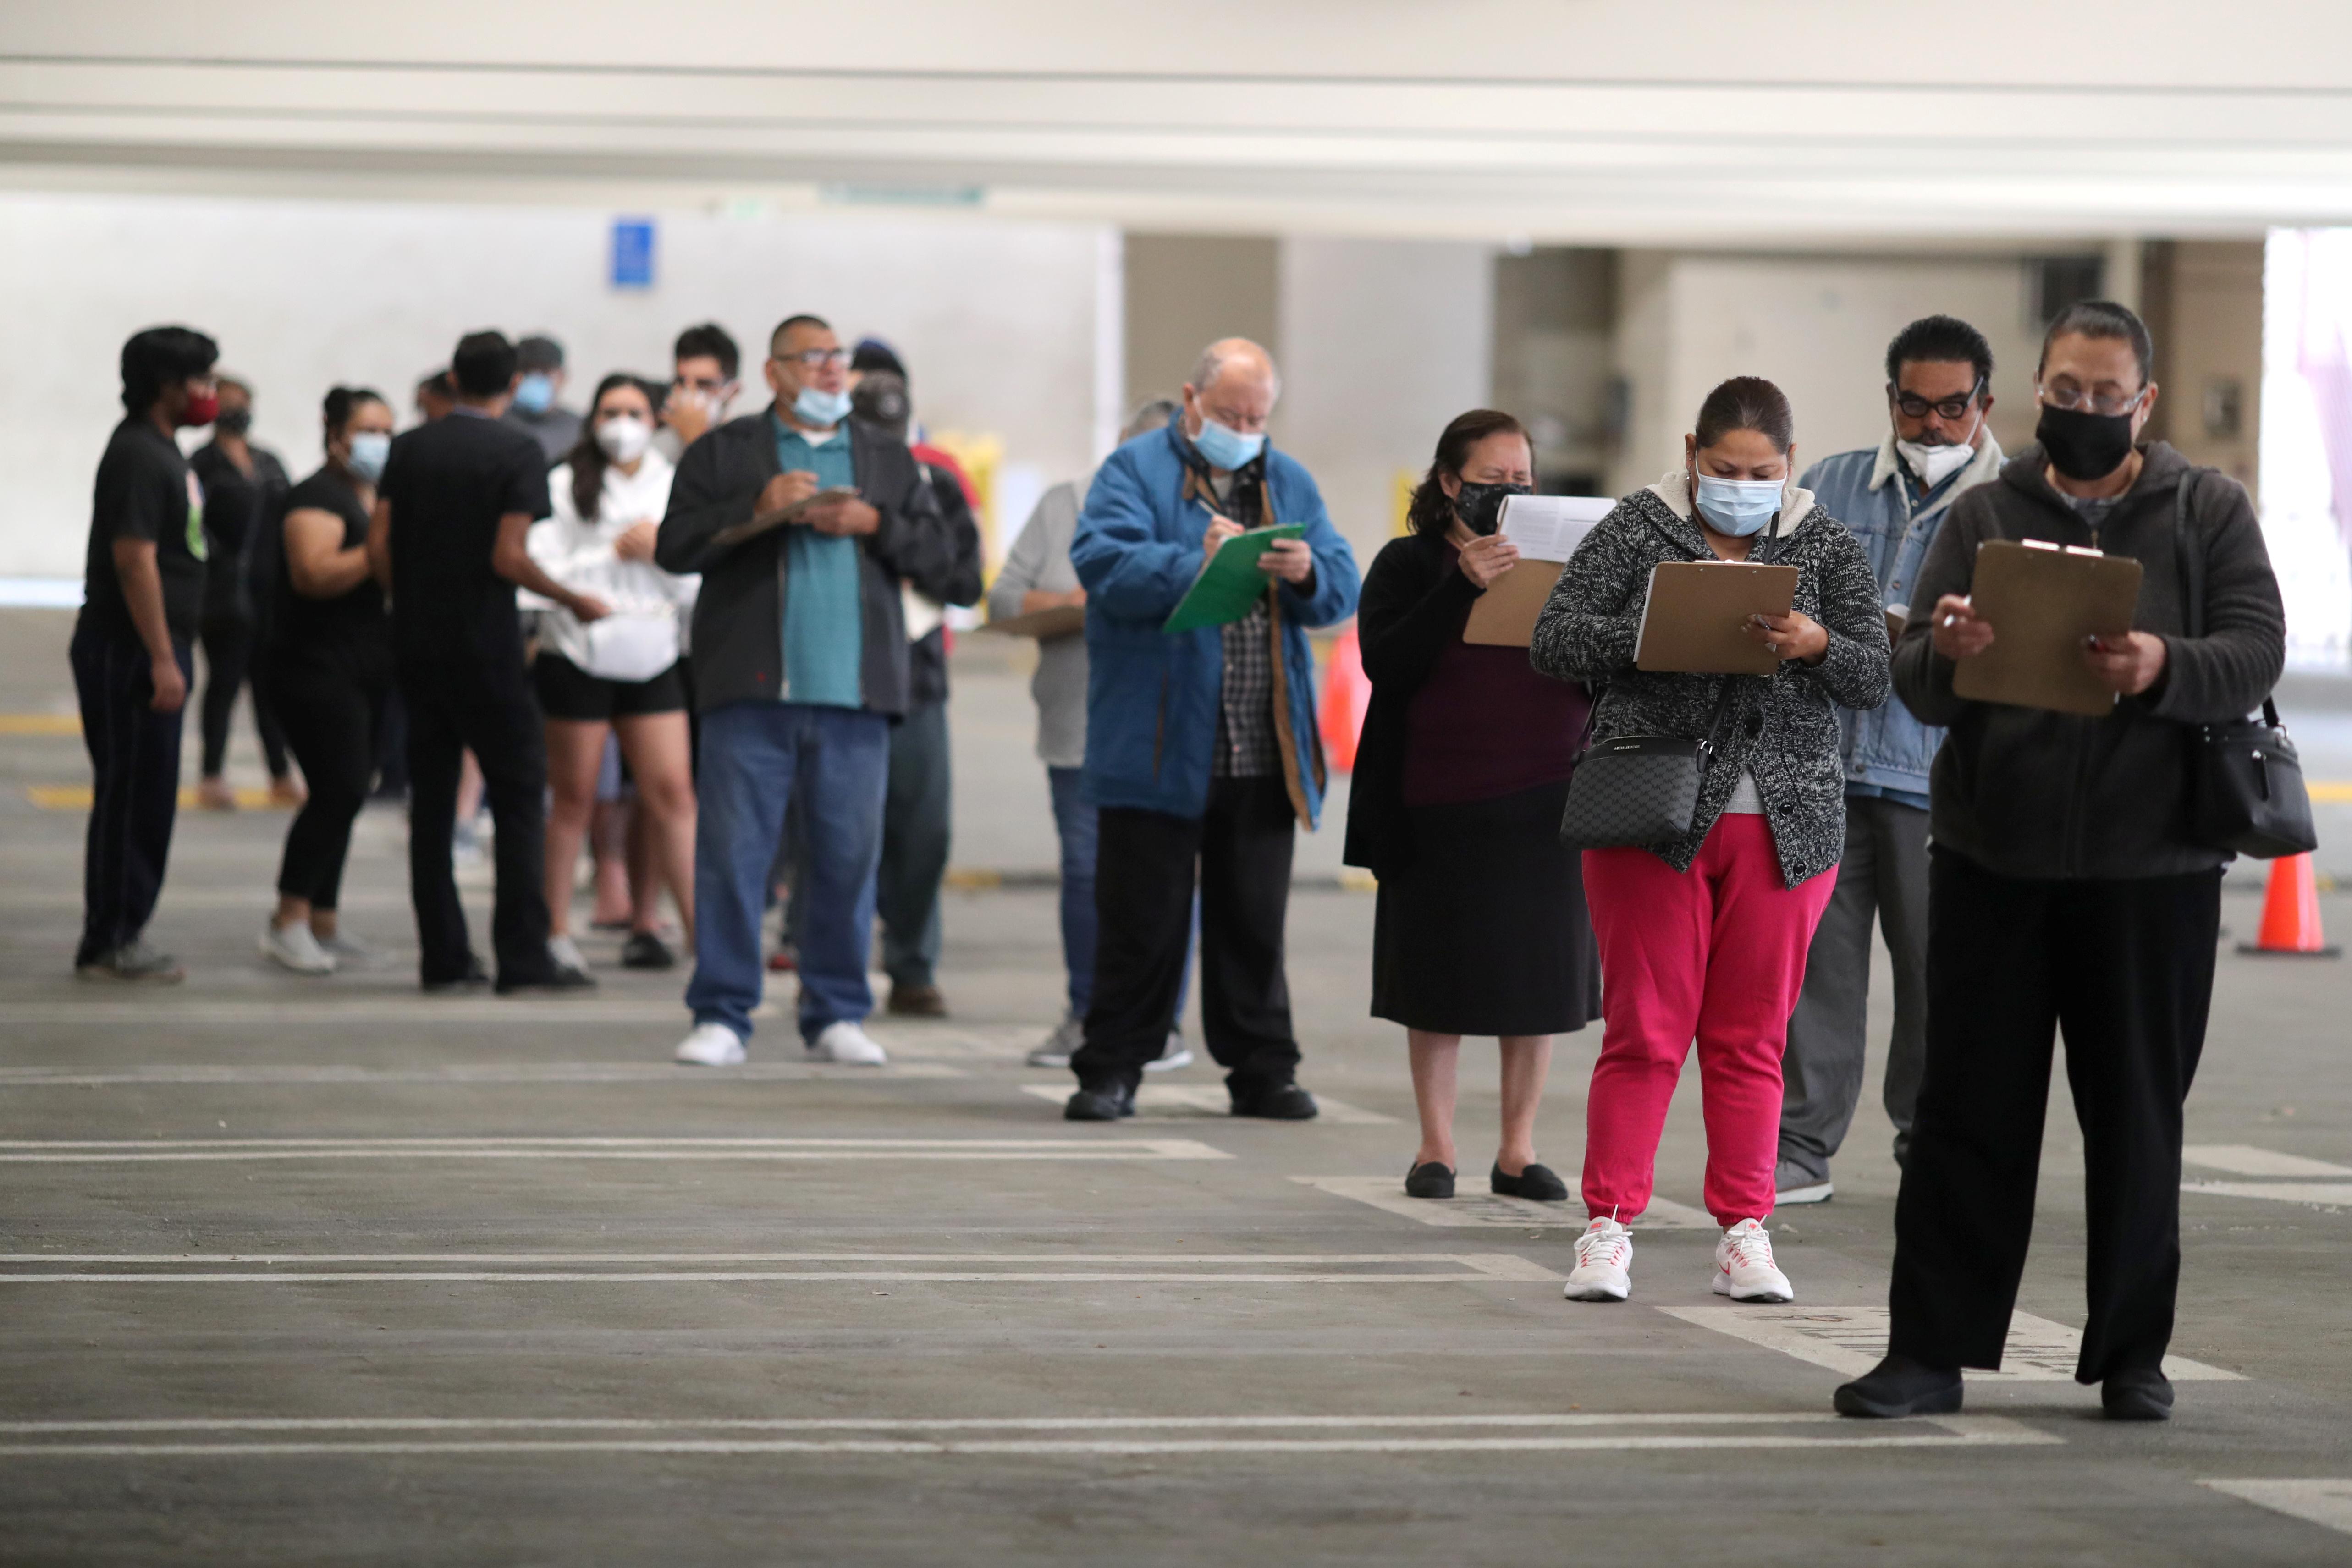 People wait for coronavirus disease (COVID-19) vaccinations, in Los Angeles, California, U.S., April 12, 2021. REUTERS/Lucy Nicholson